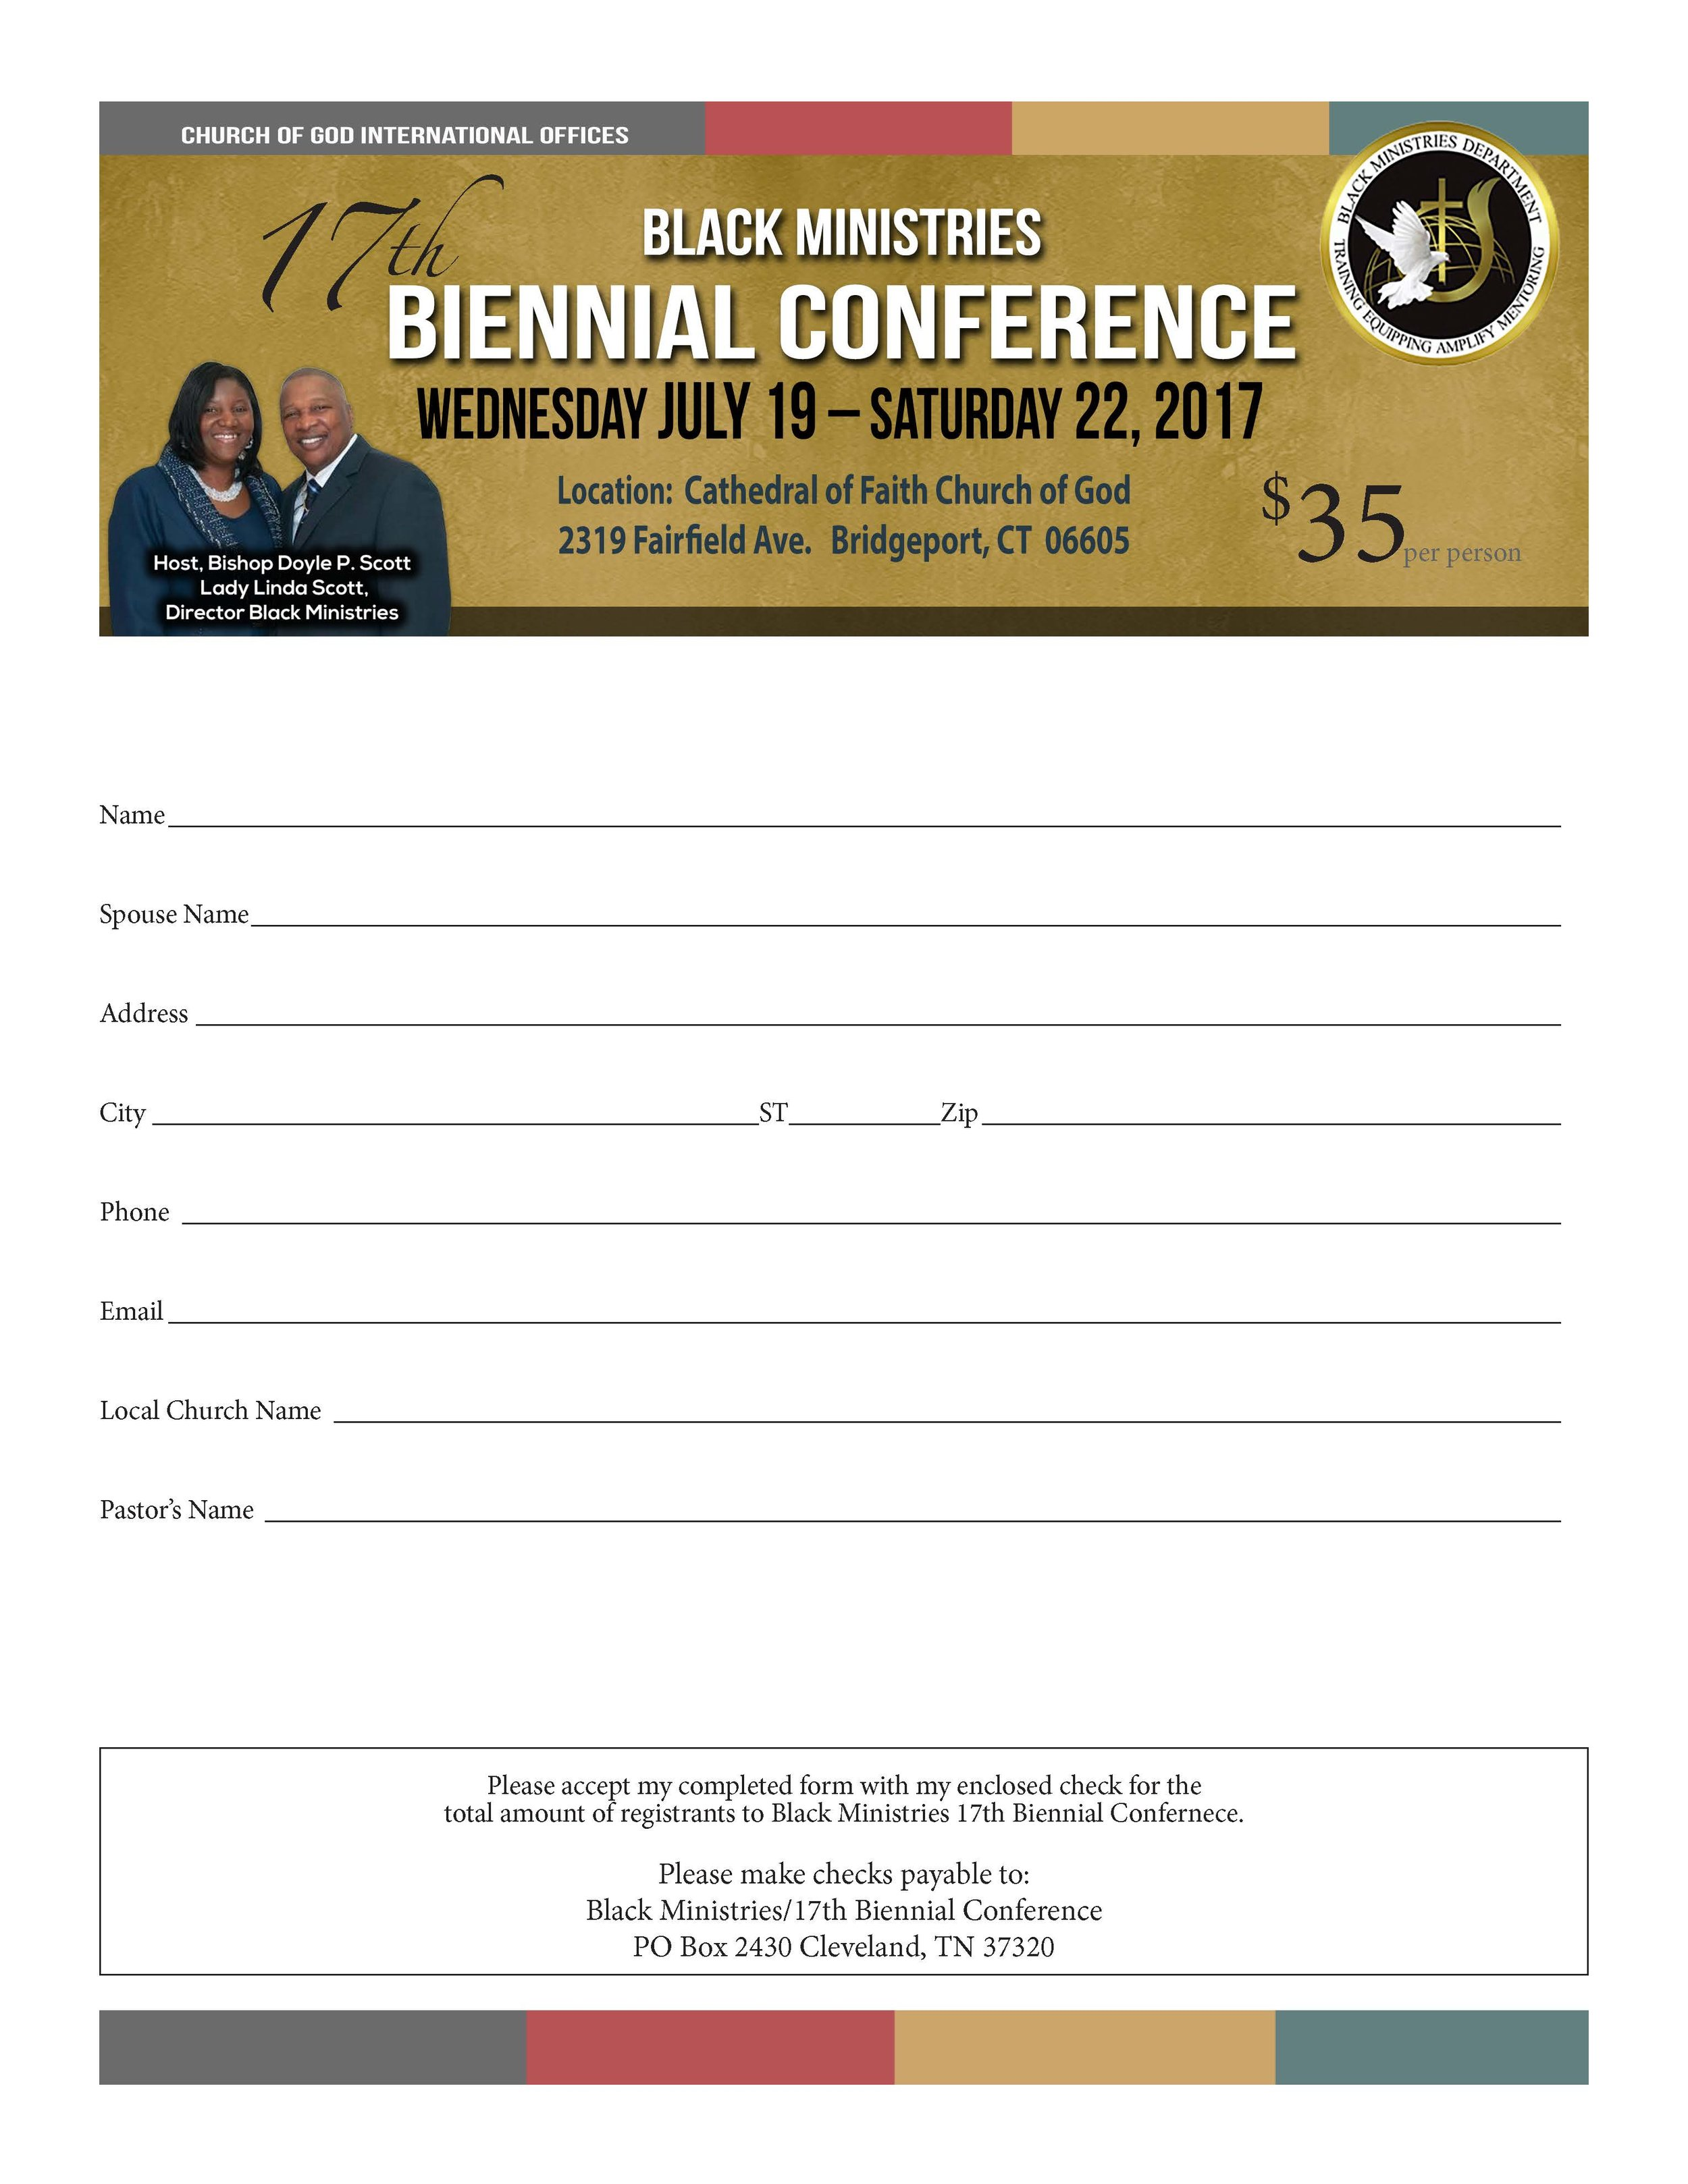 Click to download registration form.